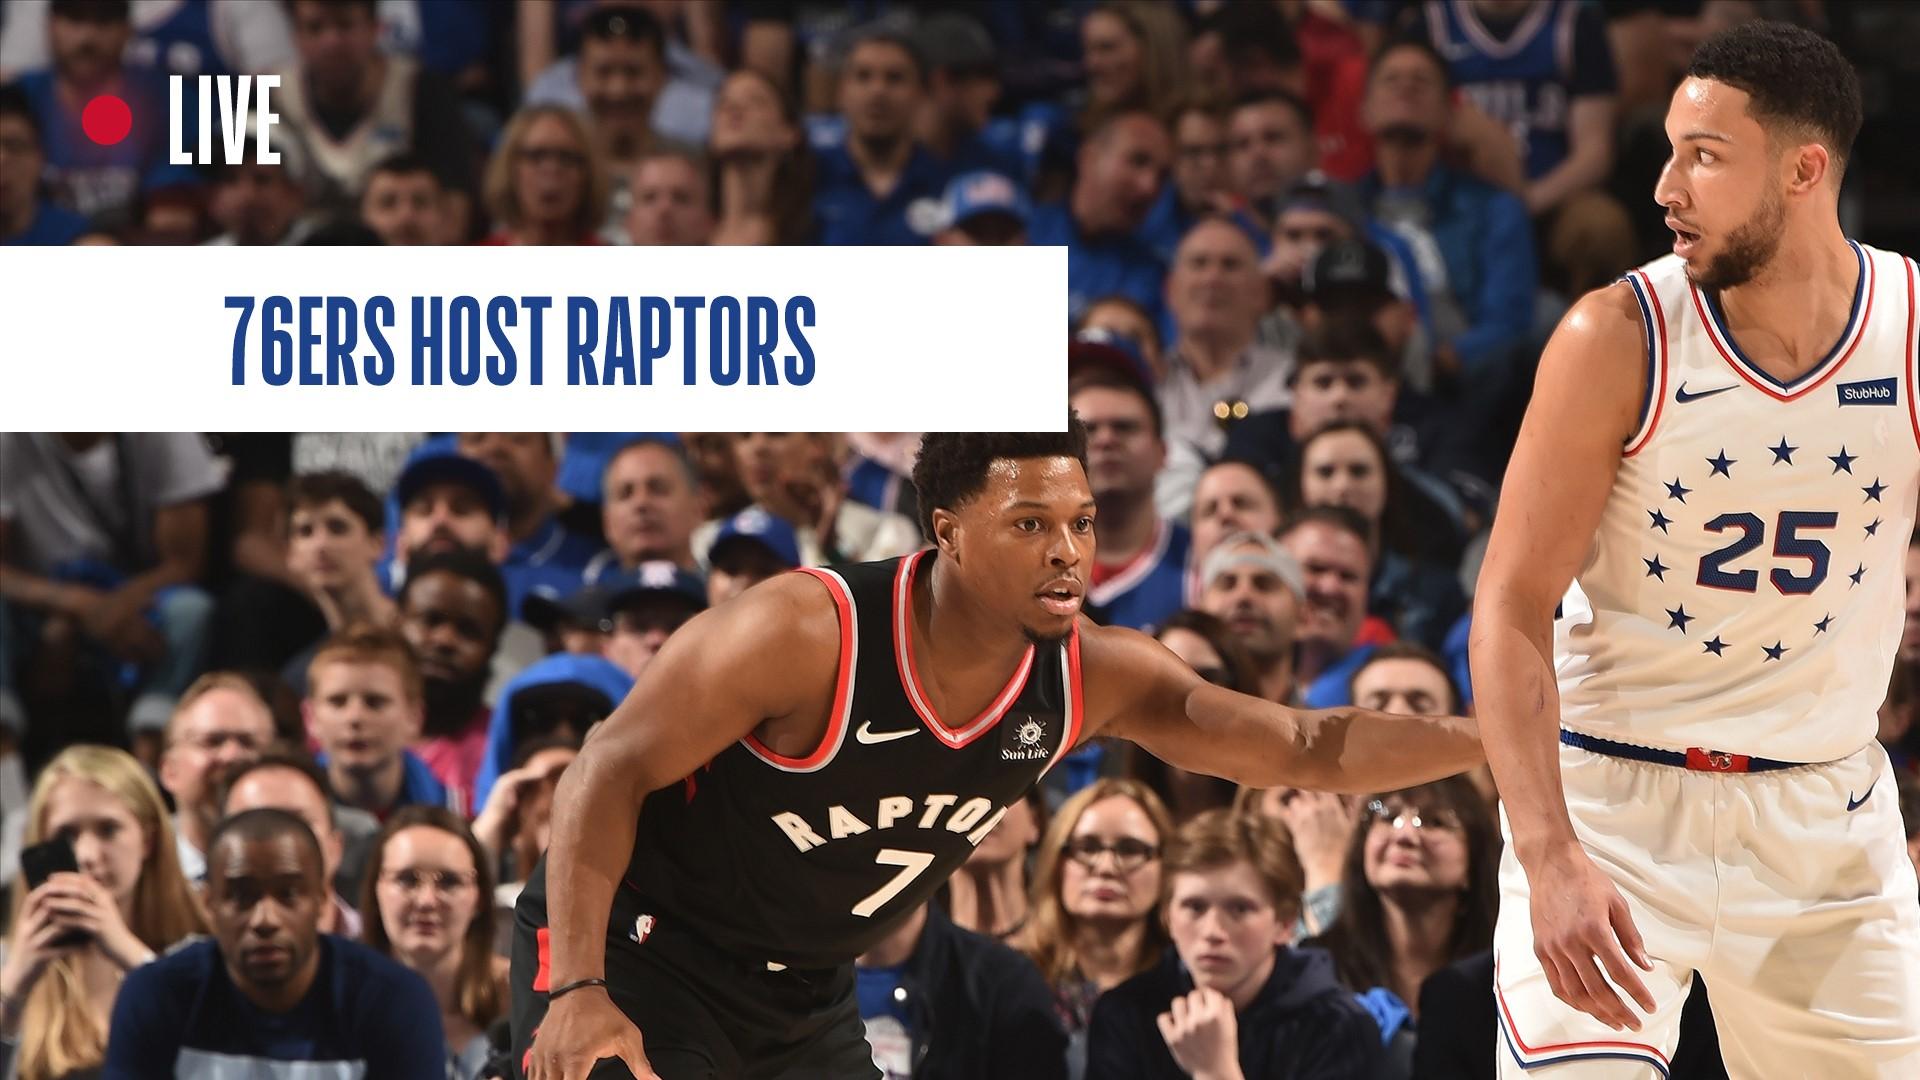 Toronto Raptors vs. Philadelphia 76ers: Live score updates, news, highlights and stats